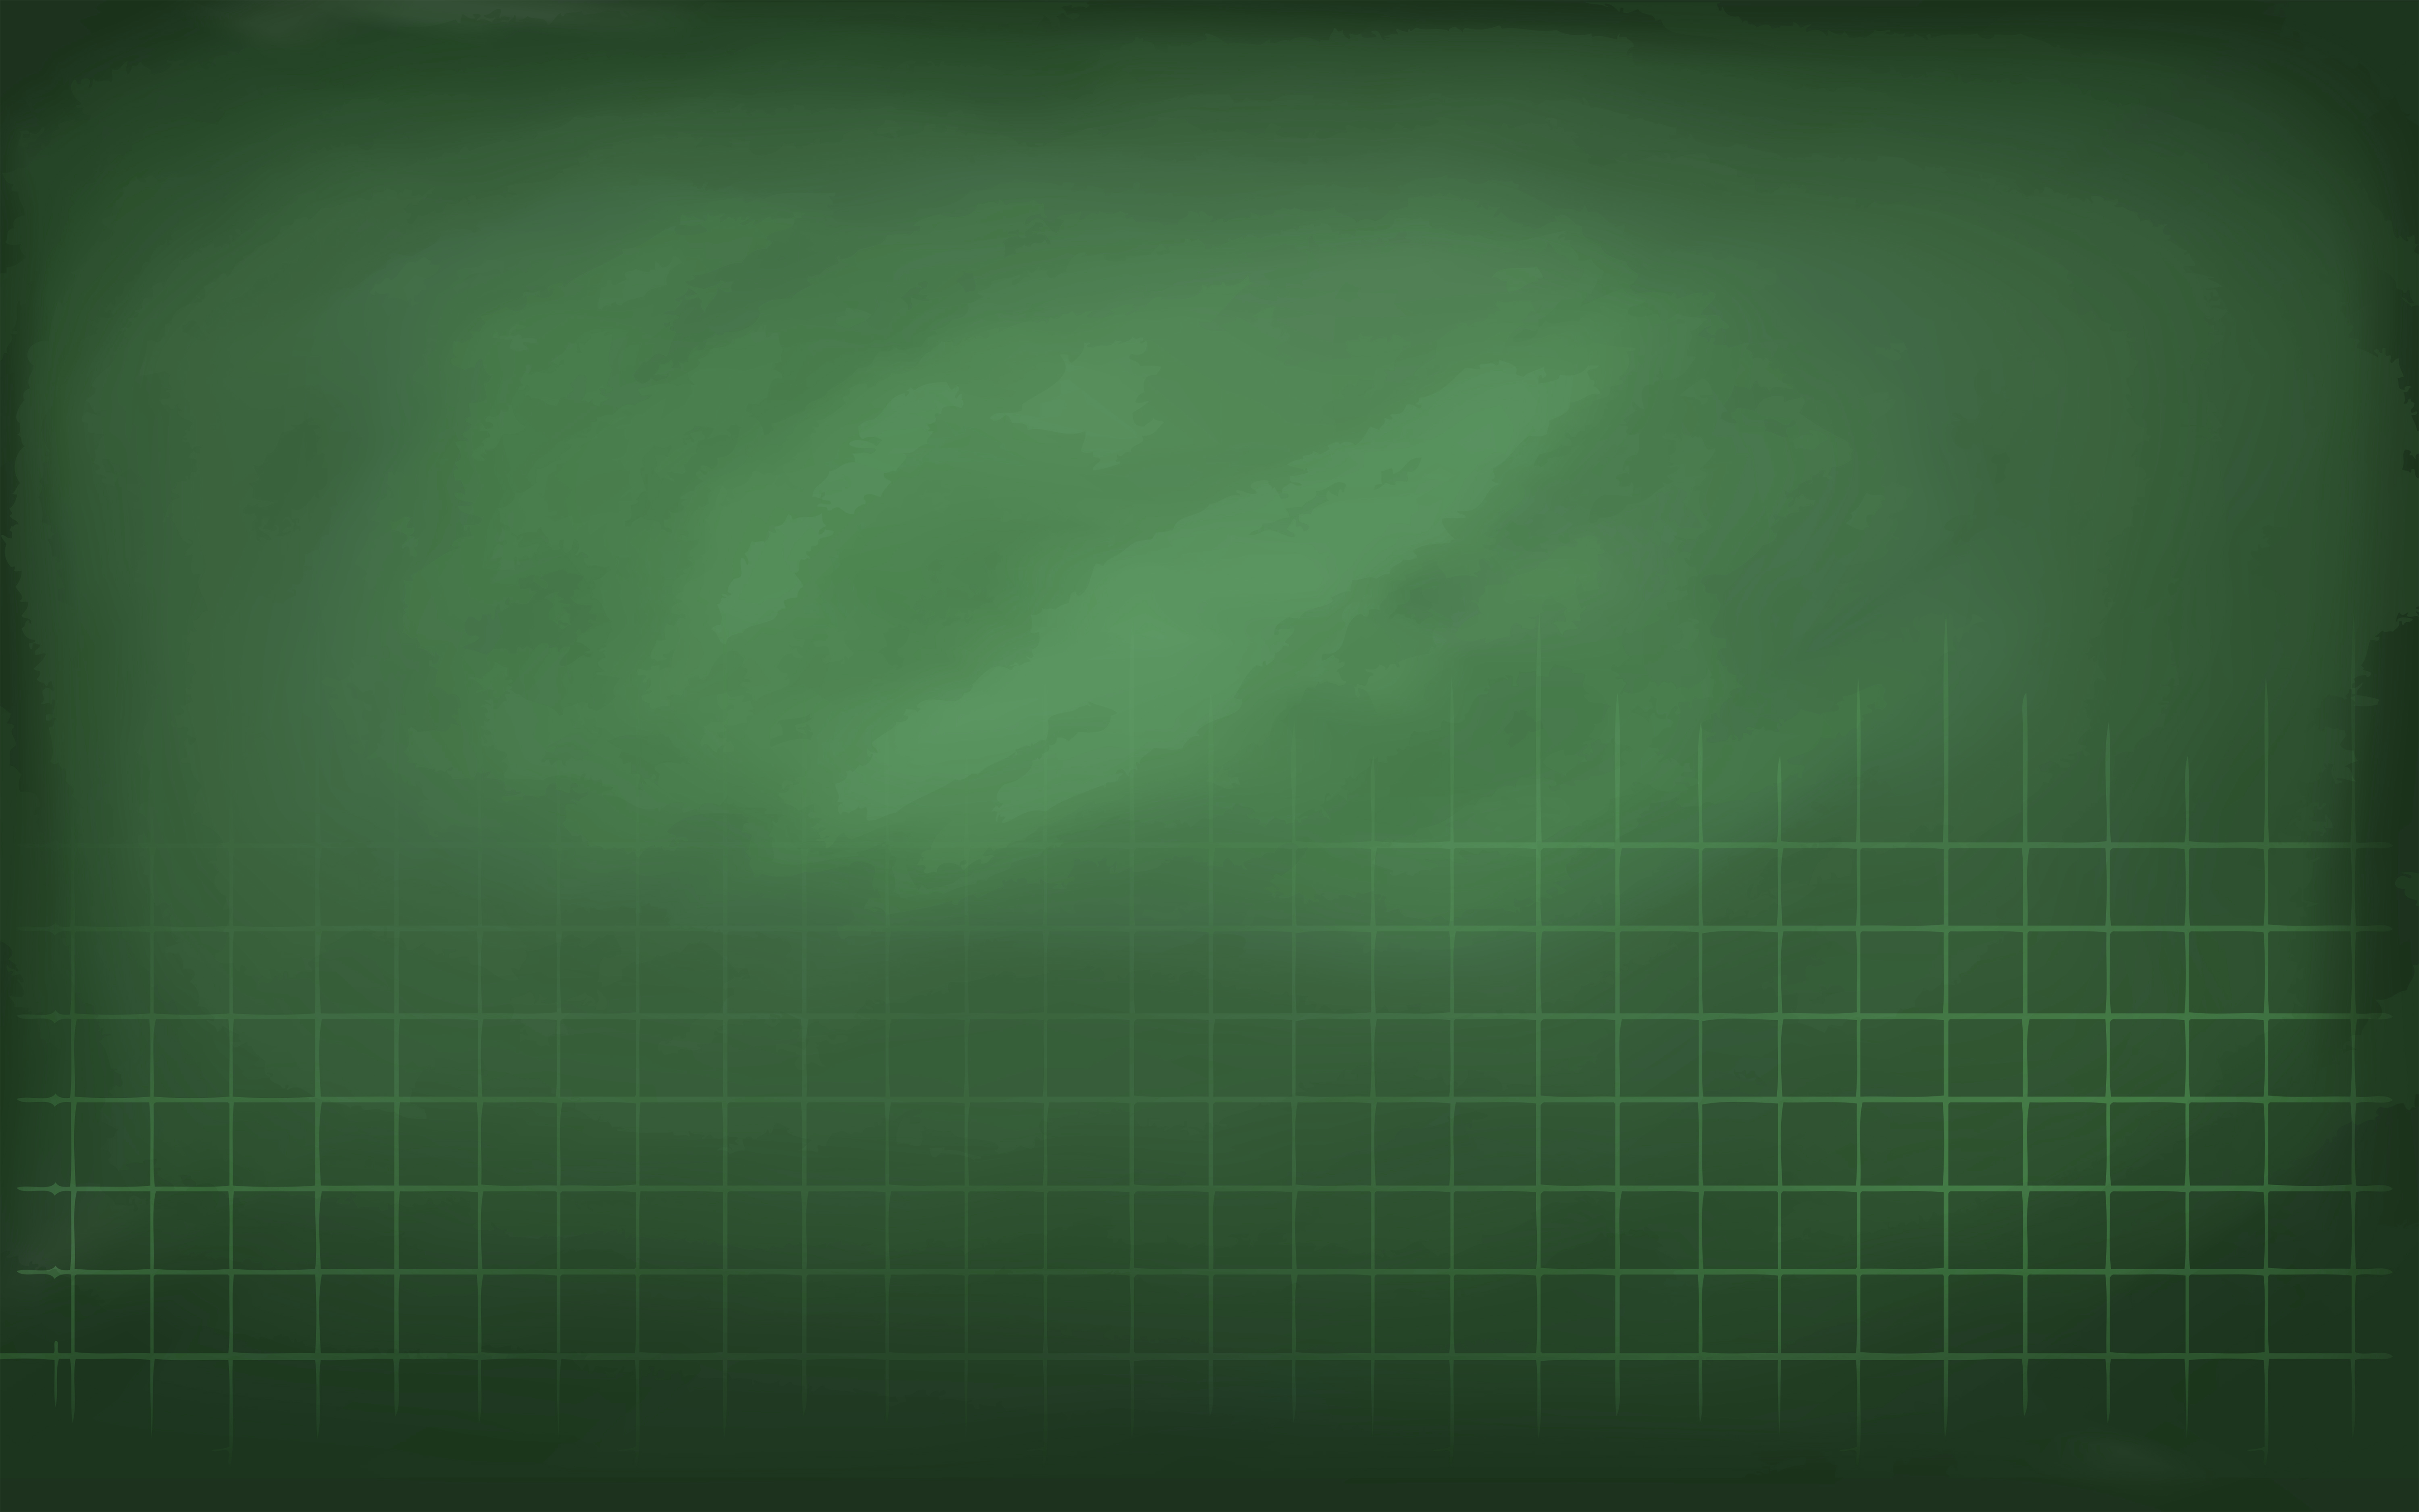 Green School Board Background Gallery Yopriceville 5500x3438